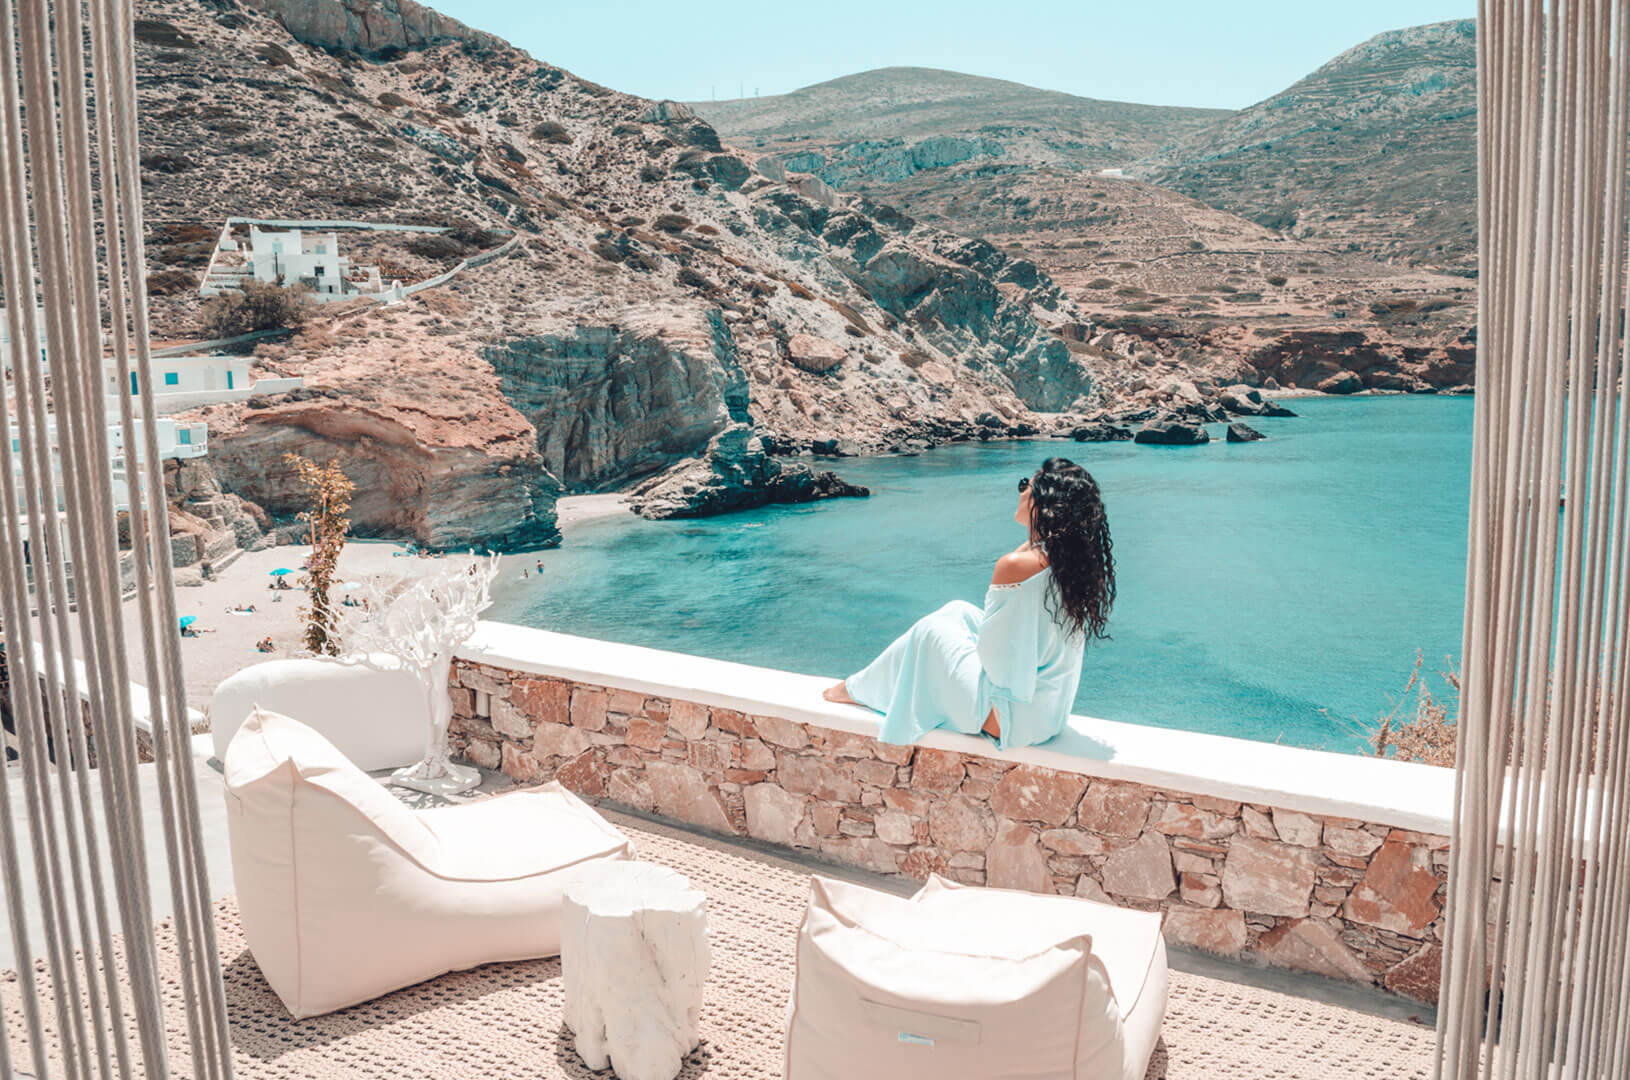 folegandros-cyclades-greece-la-vie-en-blog-all-rights-reserved